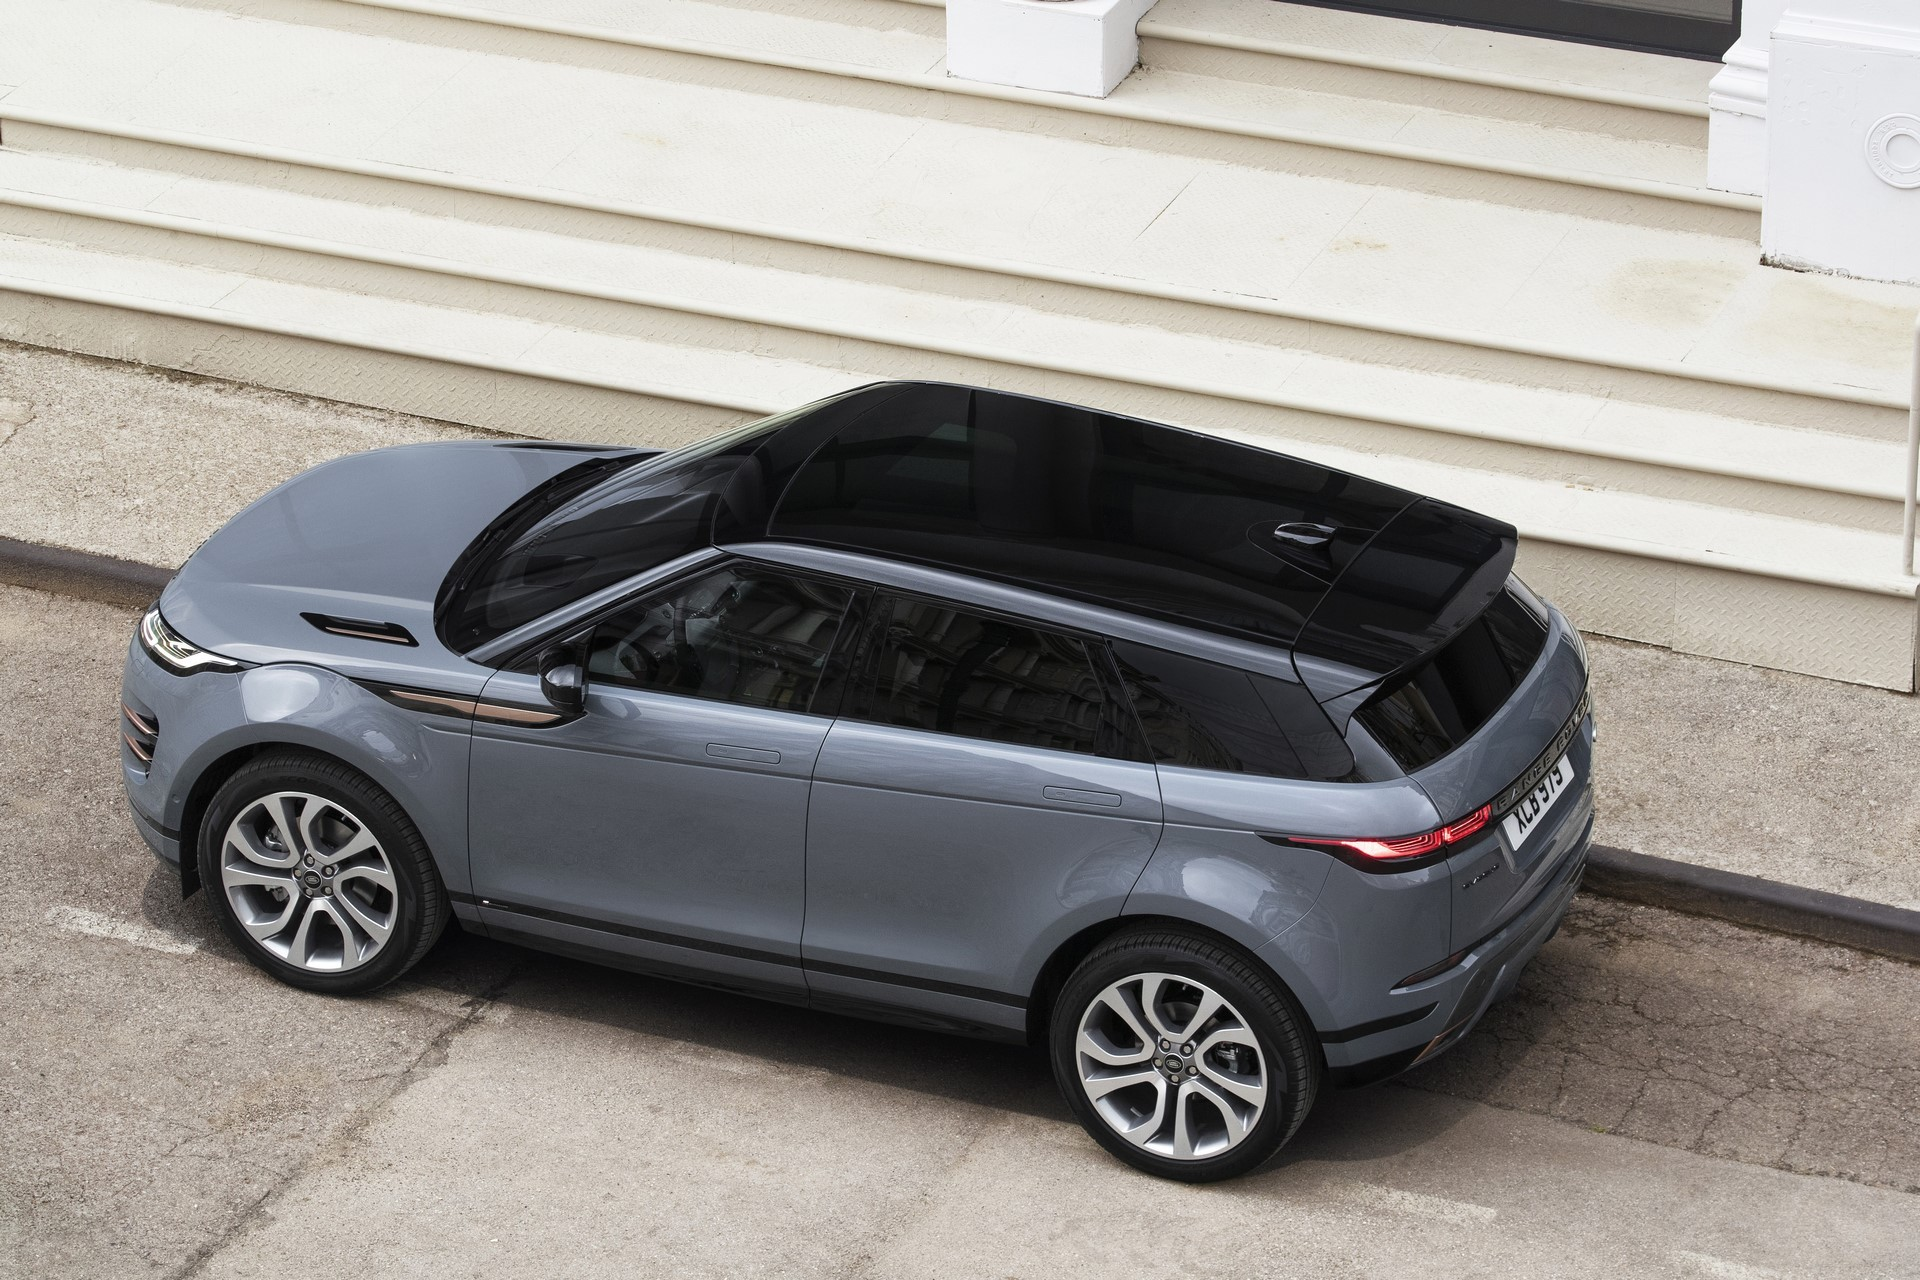 Range Rover Evoque 2019 (137)